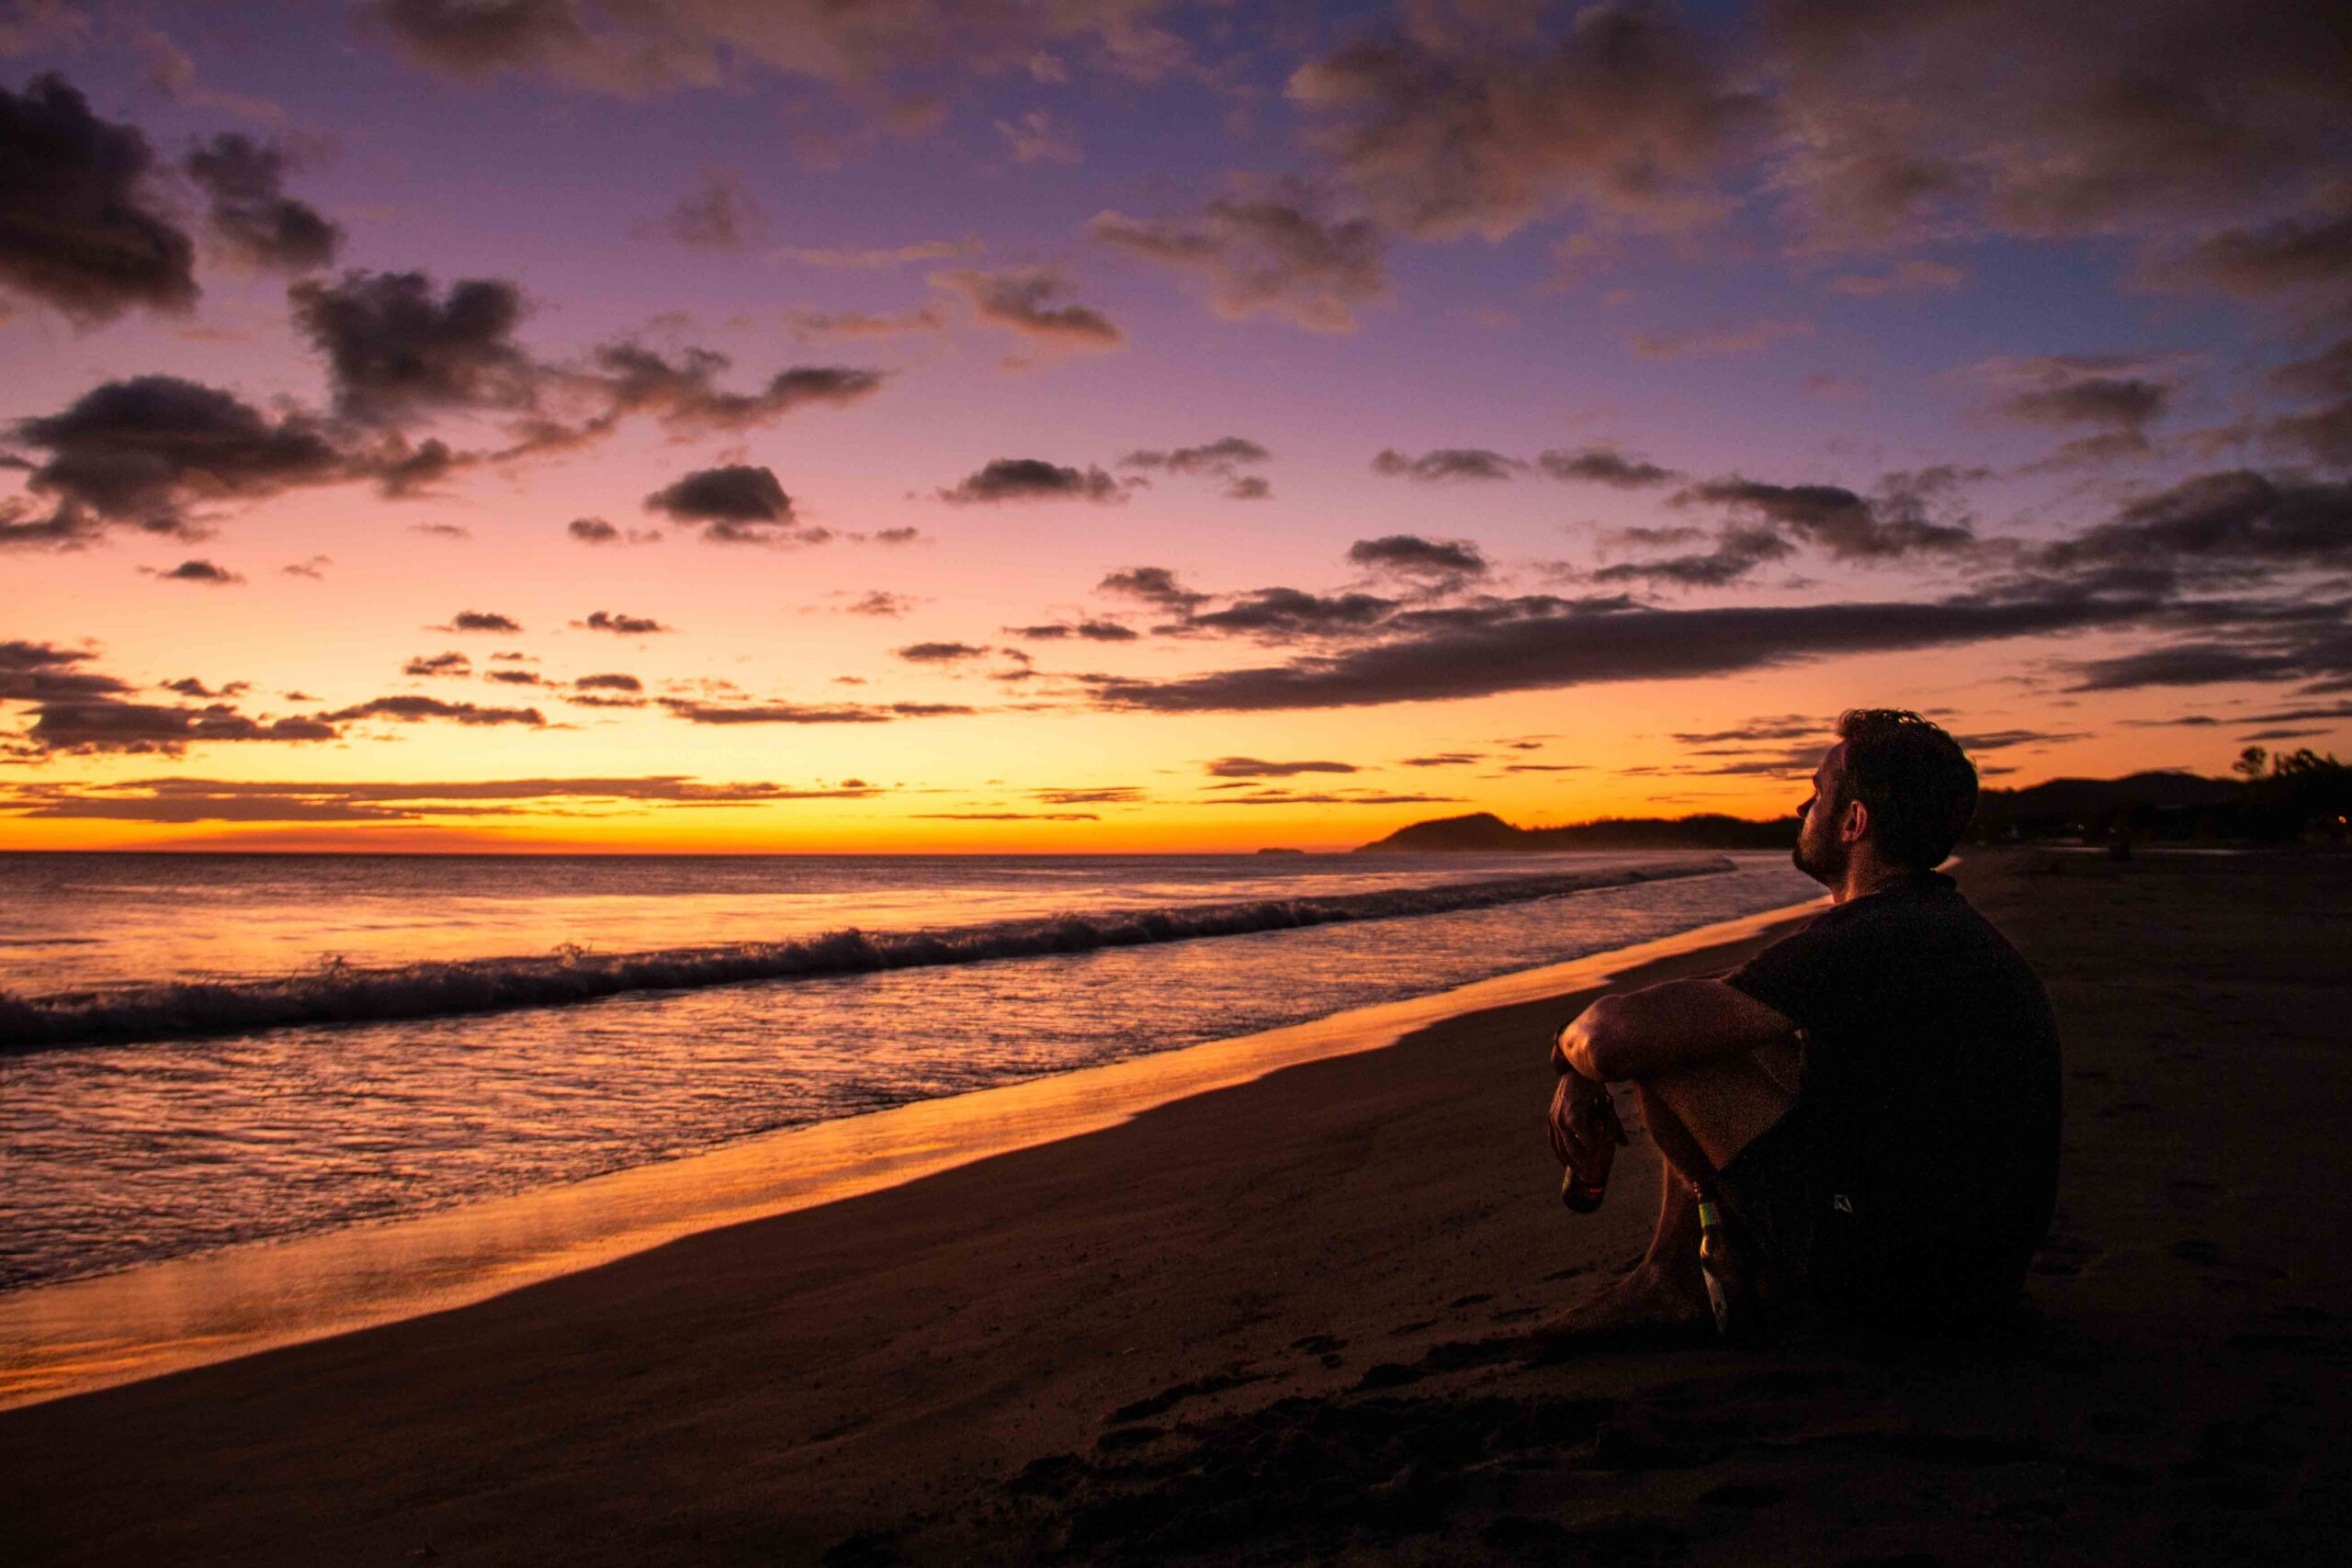 Sunset at Playa Guasacate in Nicaragua